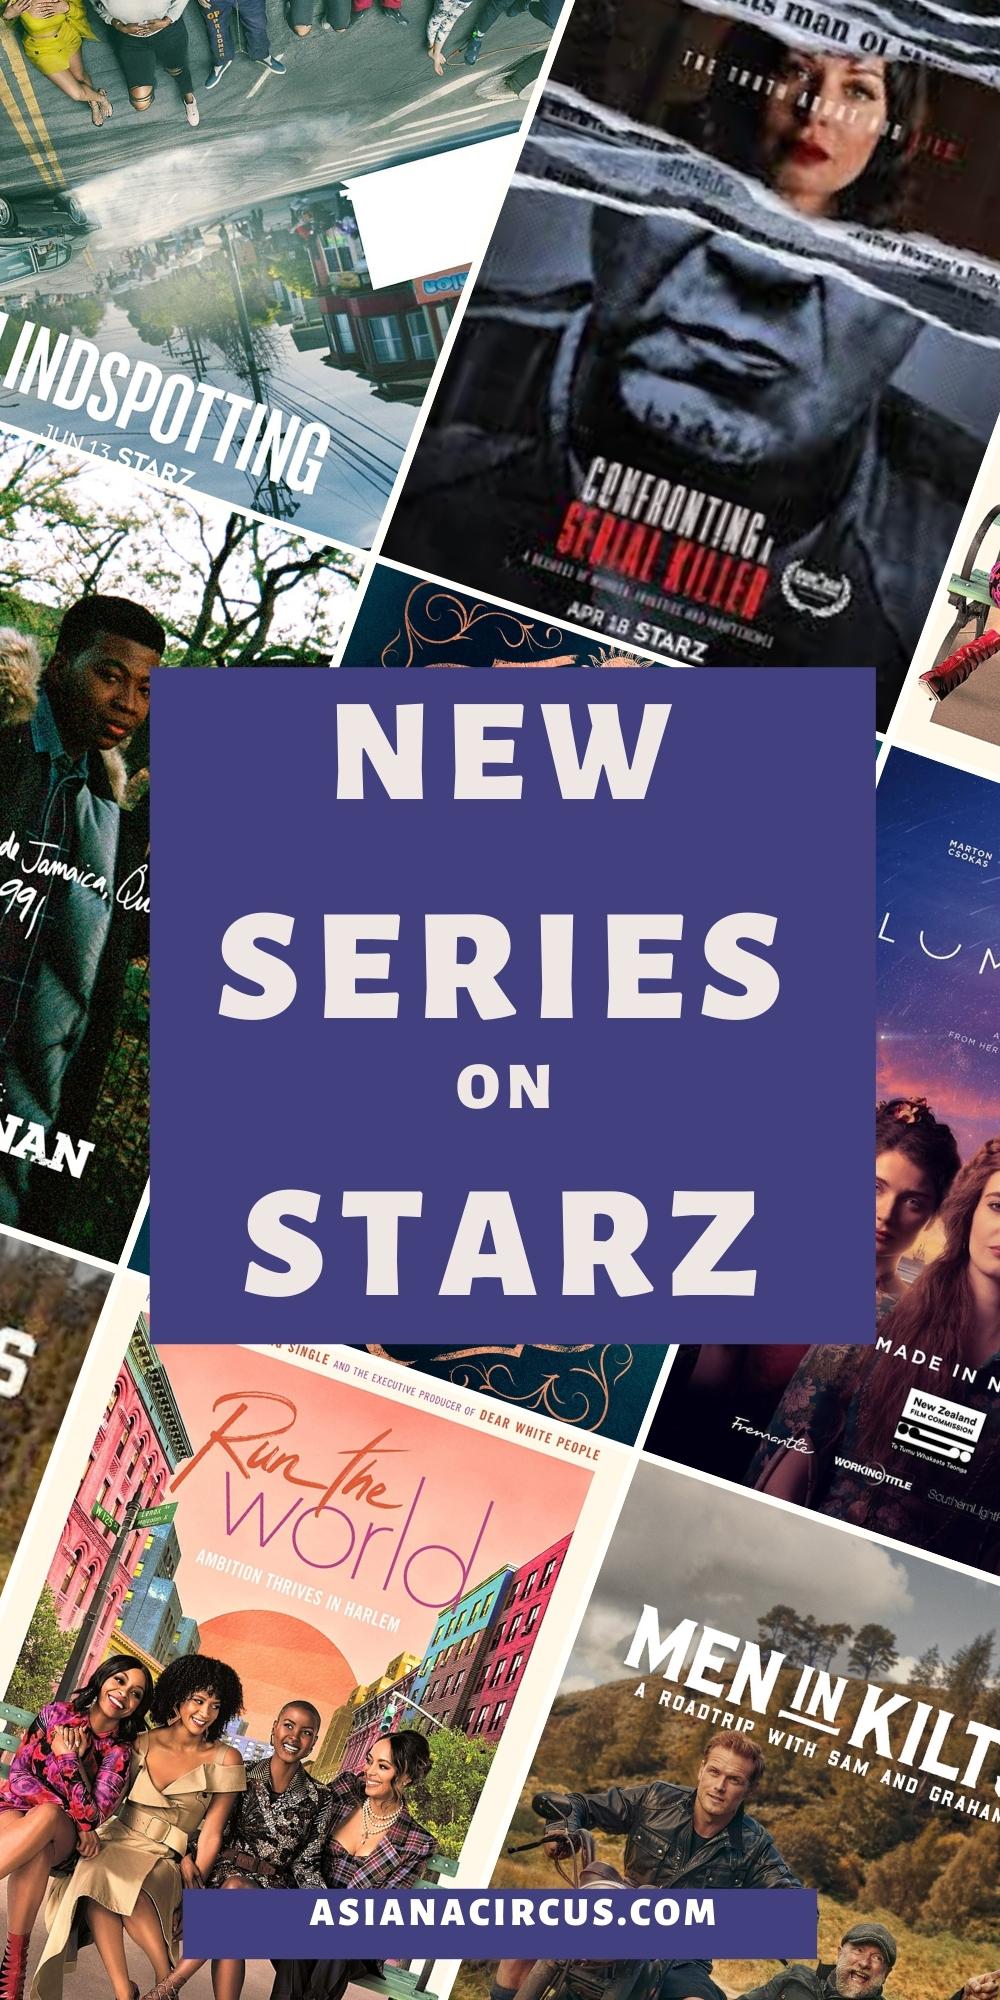 NEW series on starz